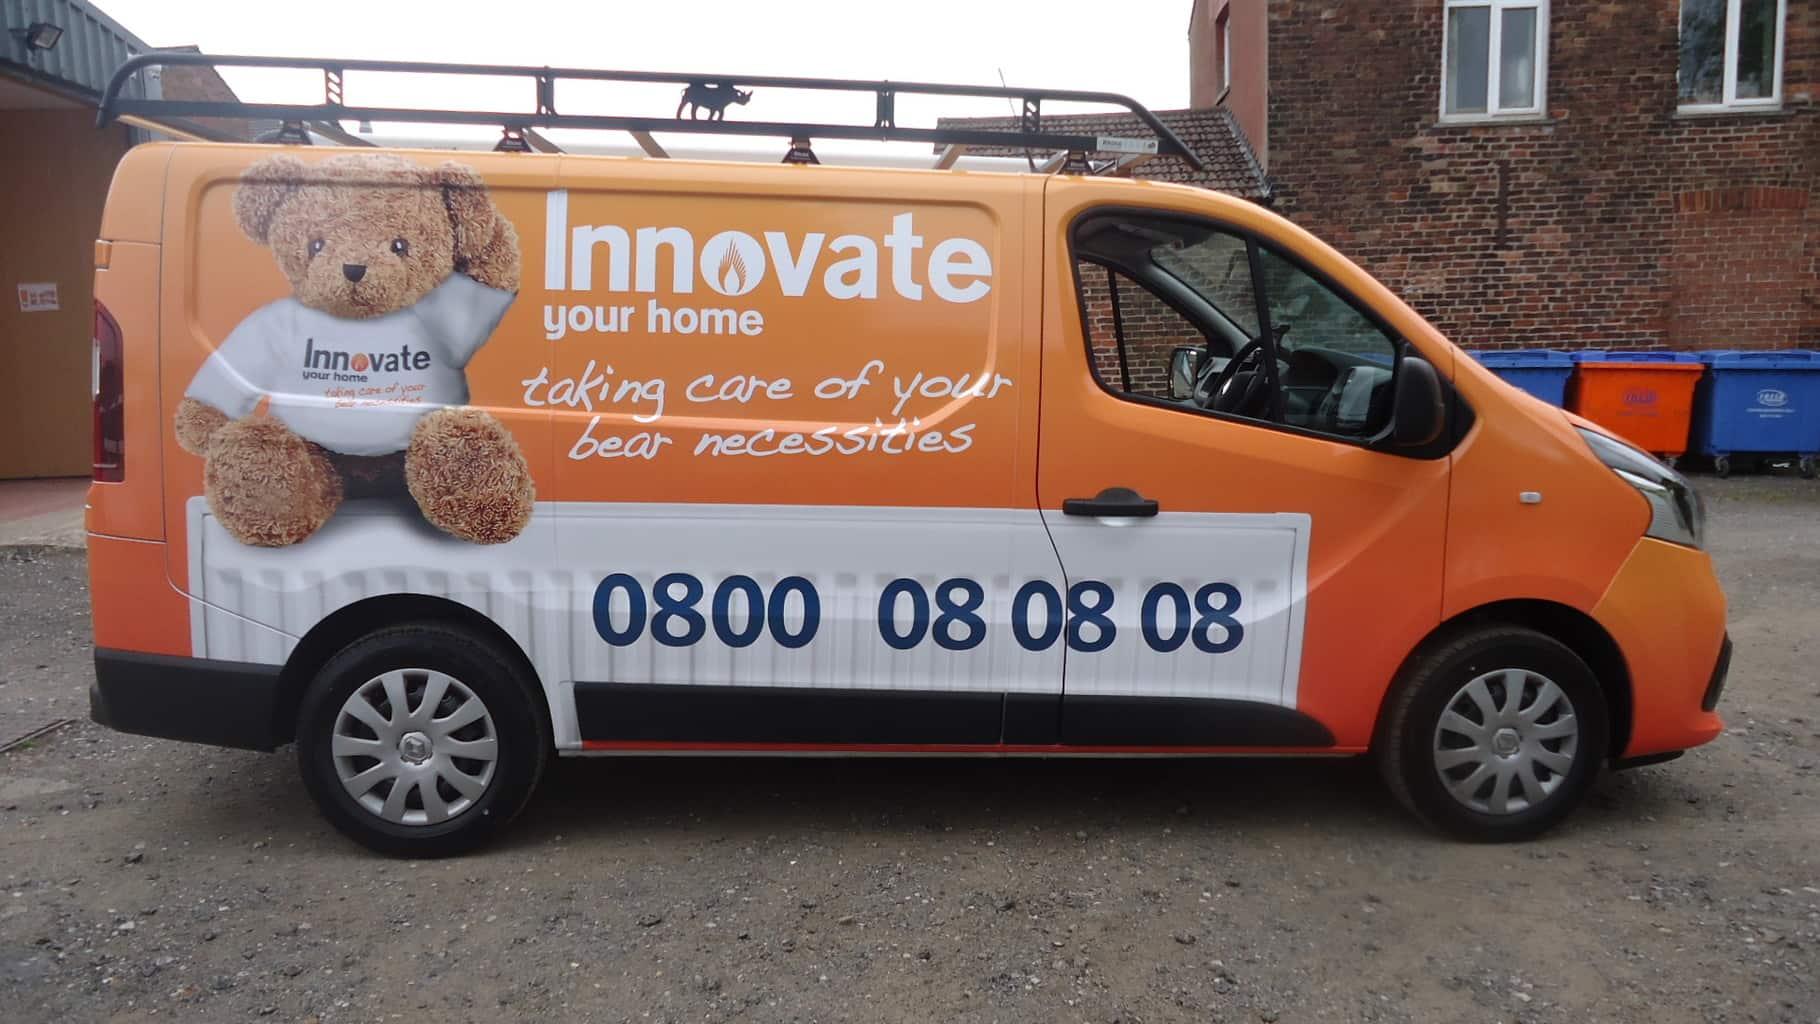 Full Vehicle Wrap For 'Innovate'